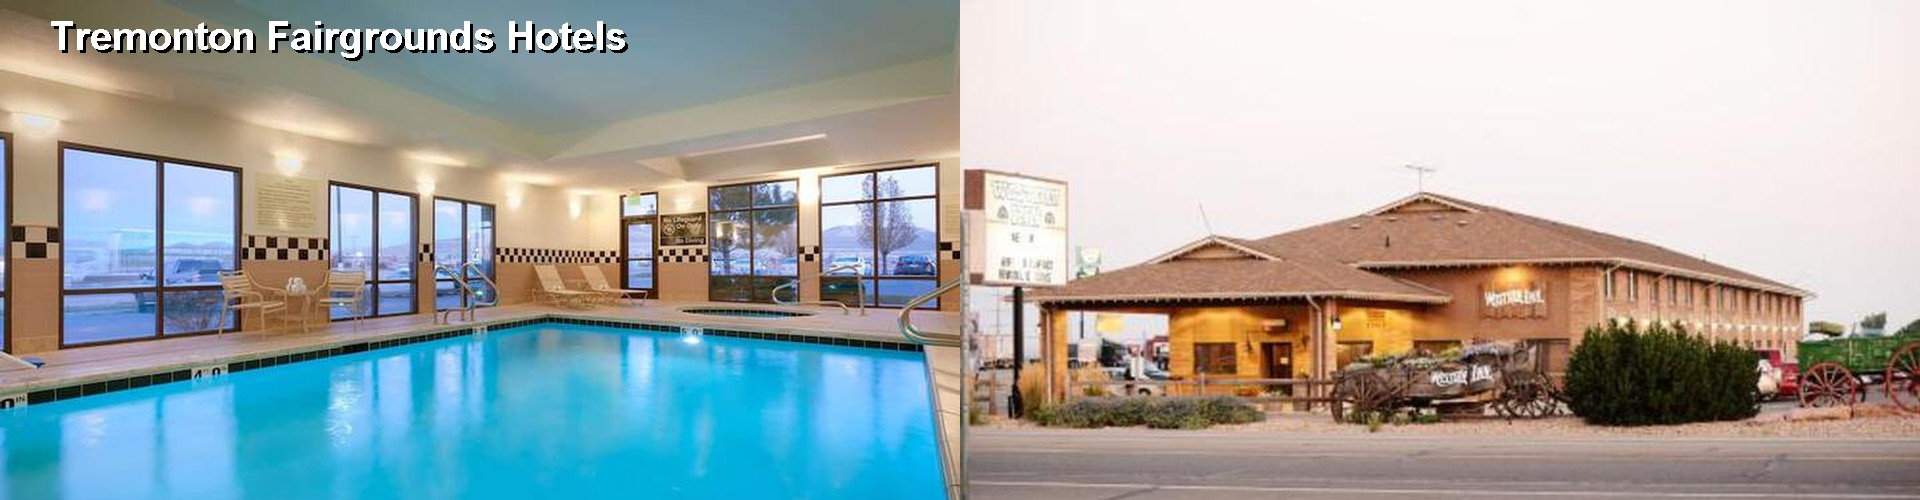 5 Best Hotels Near Tremonton Fairgrounds